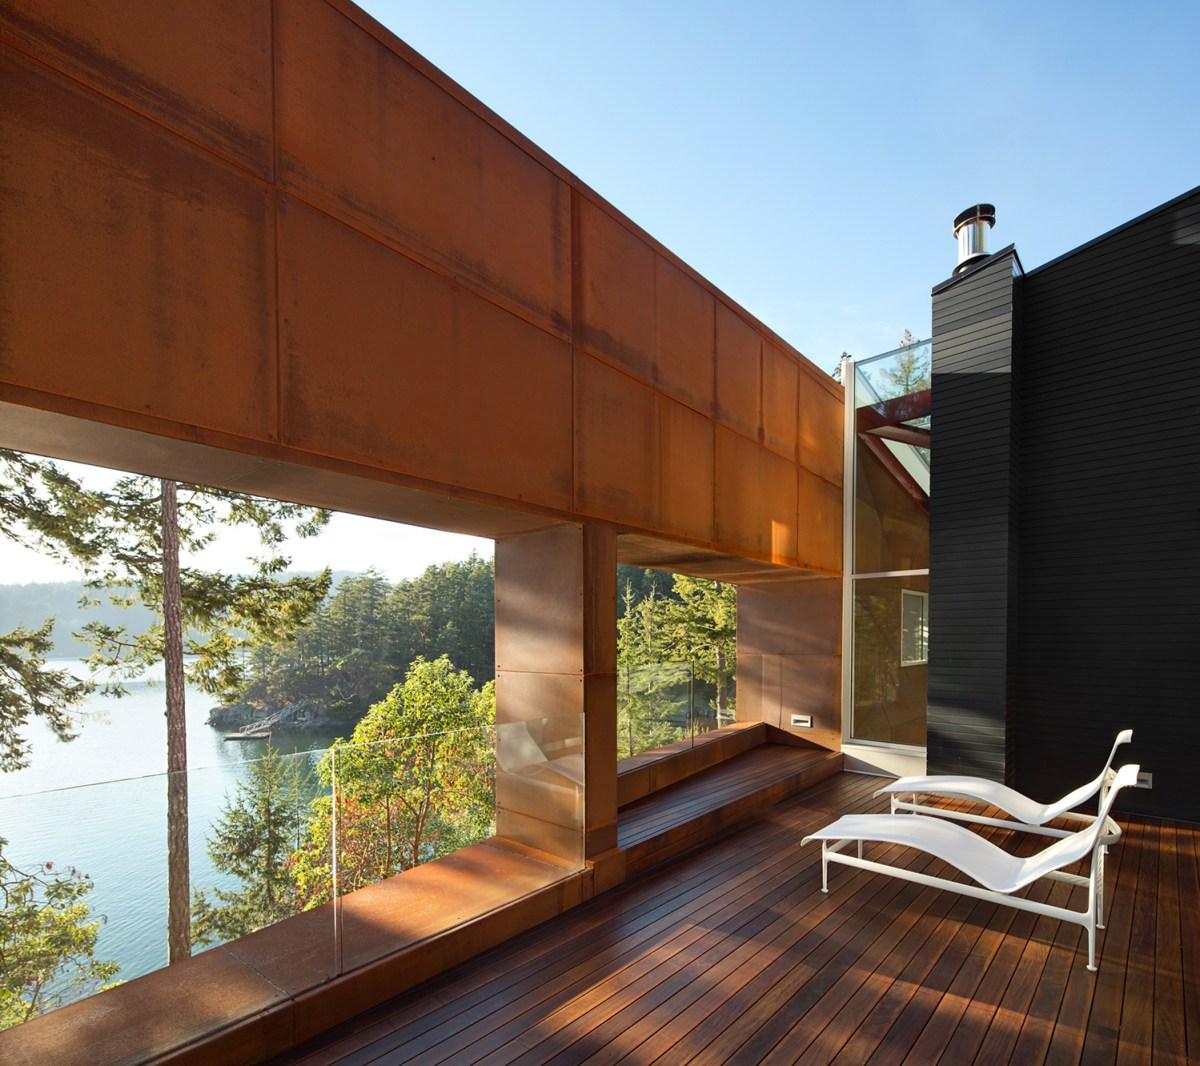 Gulf+Islands+Vancouver+deck